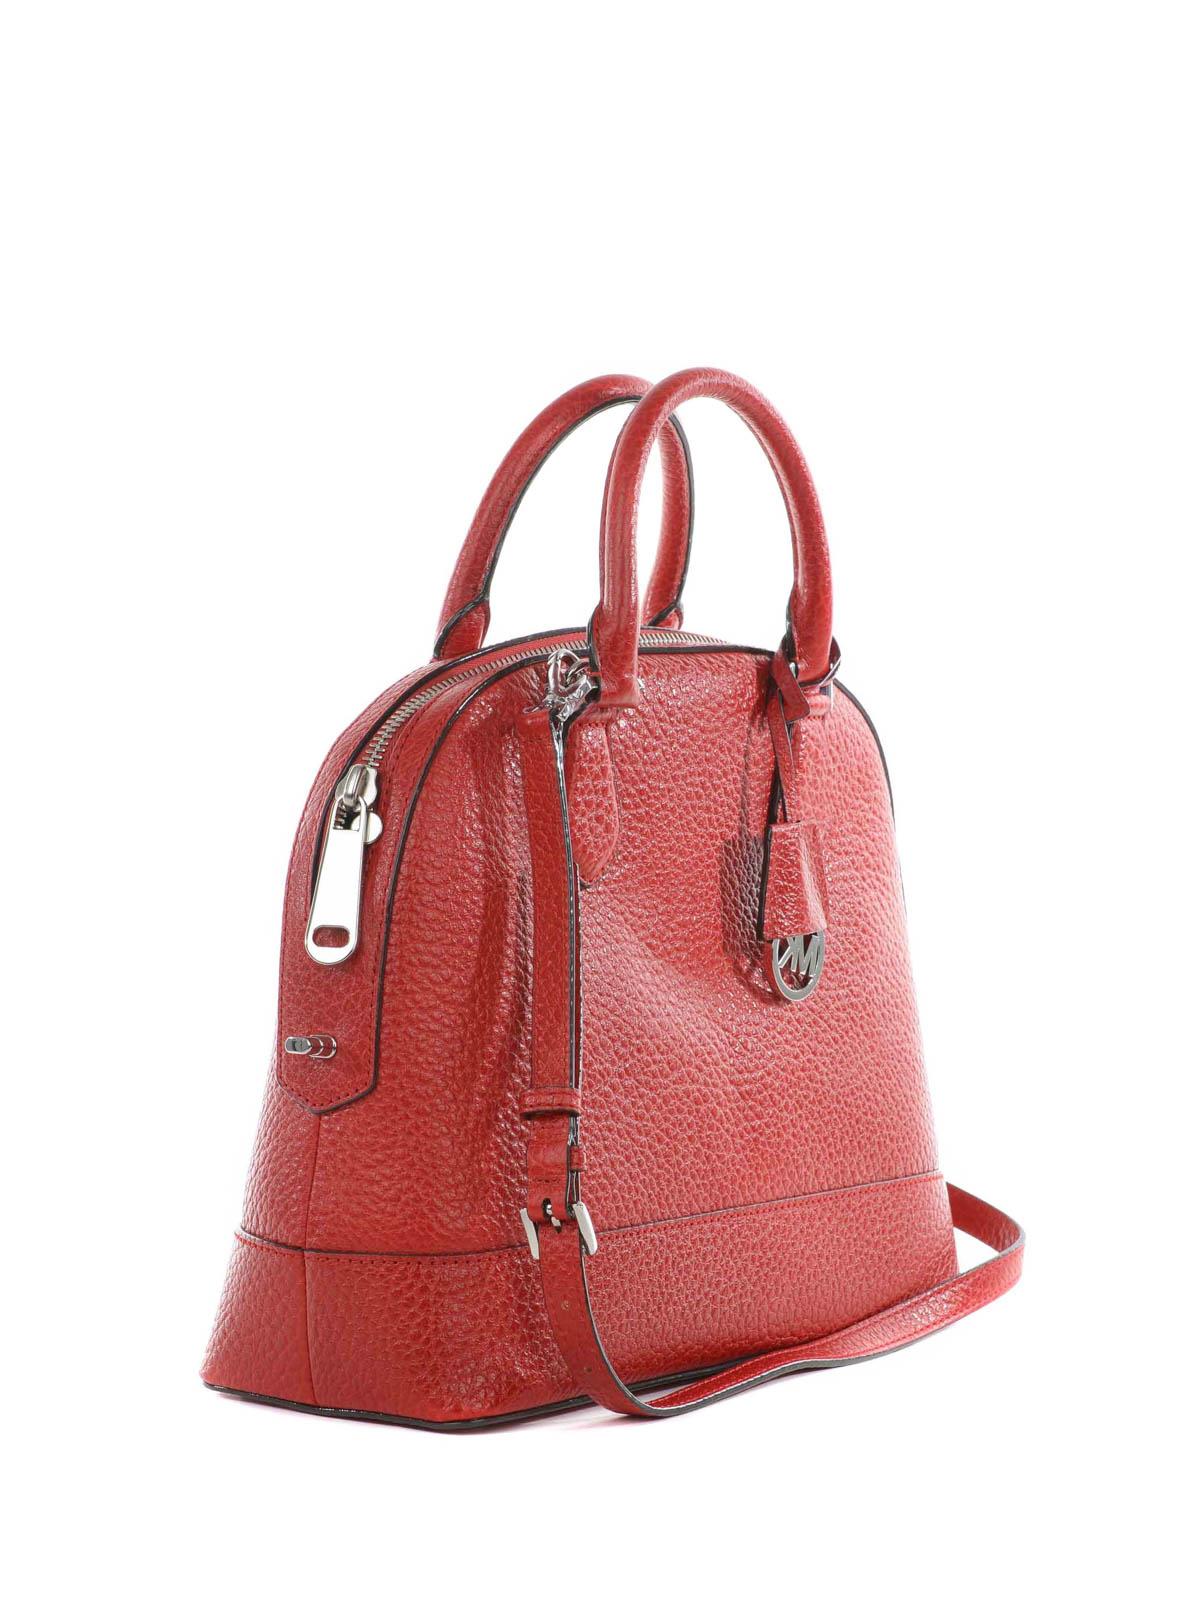 3142885c1b92 MICHAEL KORS  totes bags online - Smythe large leather handbag